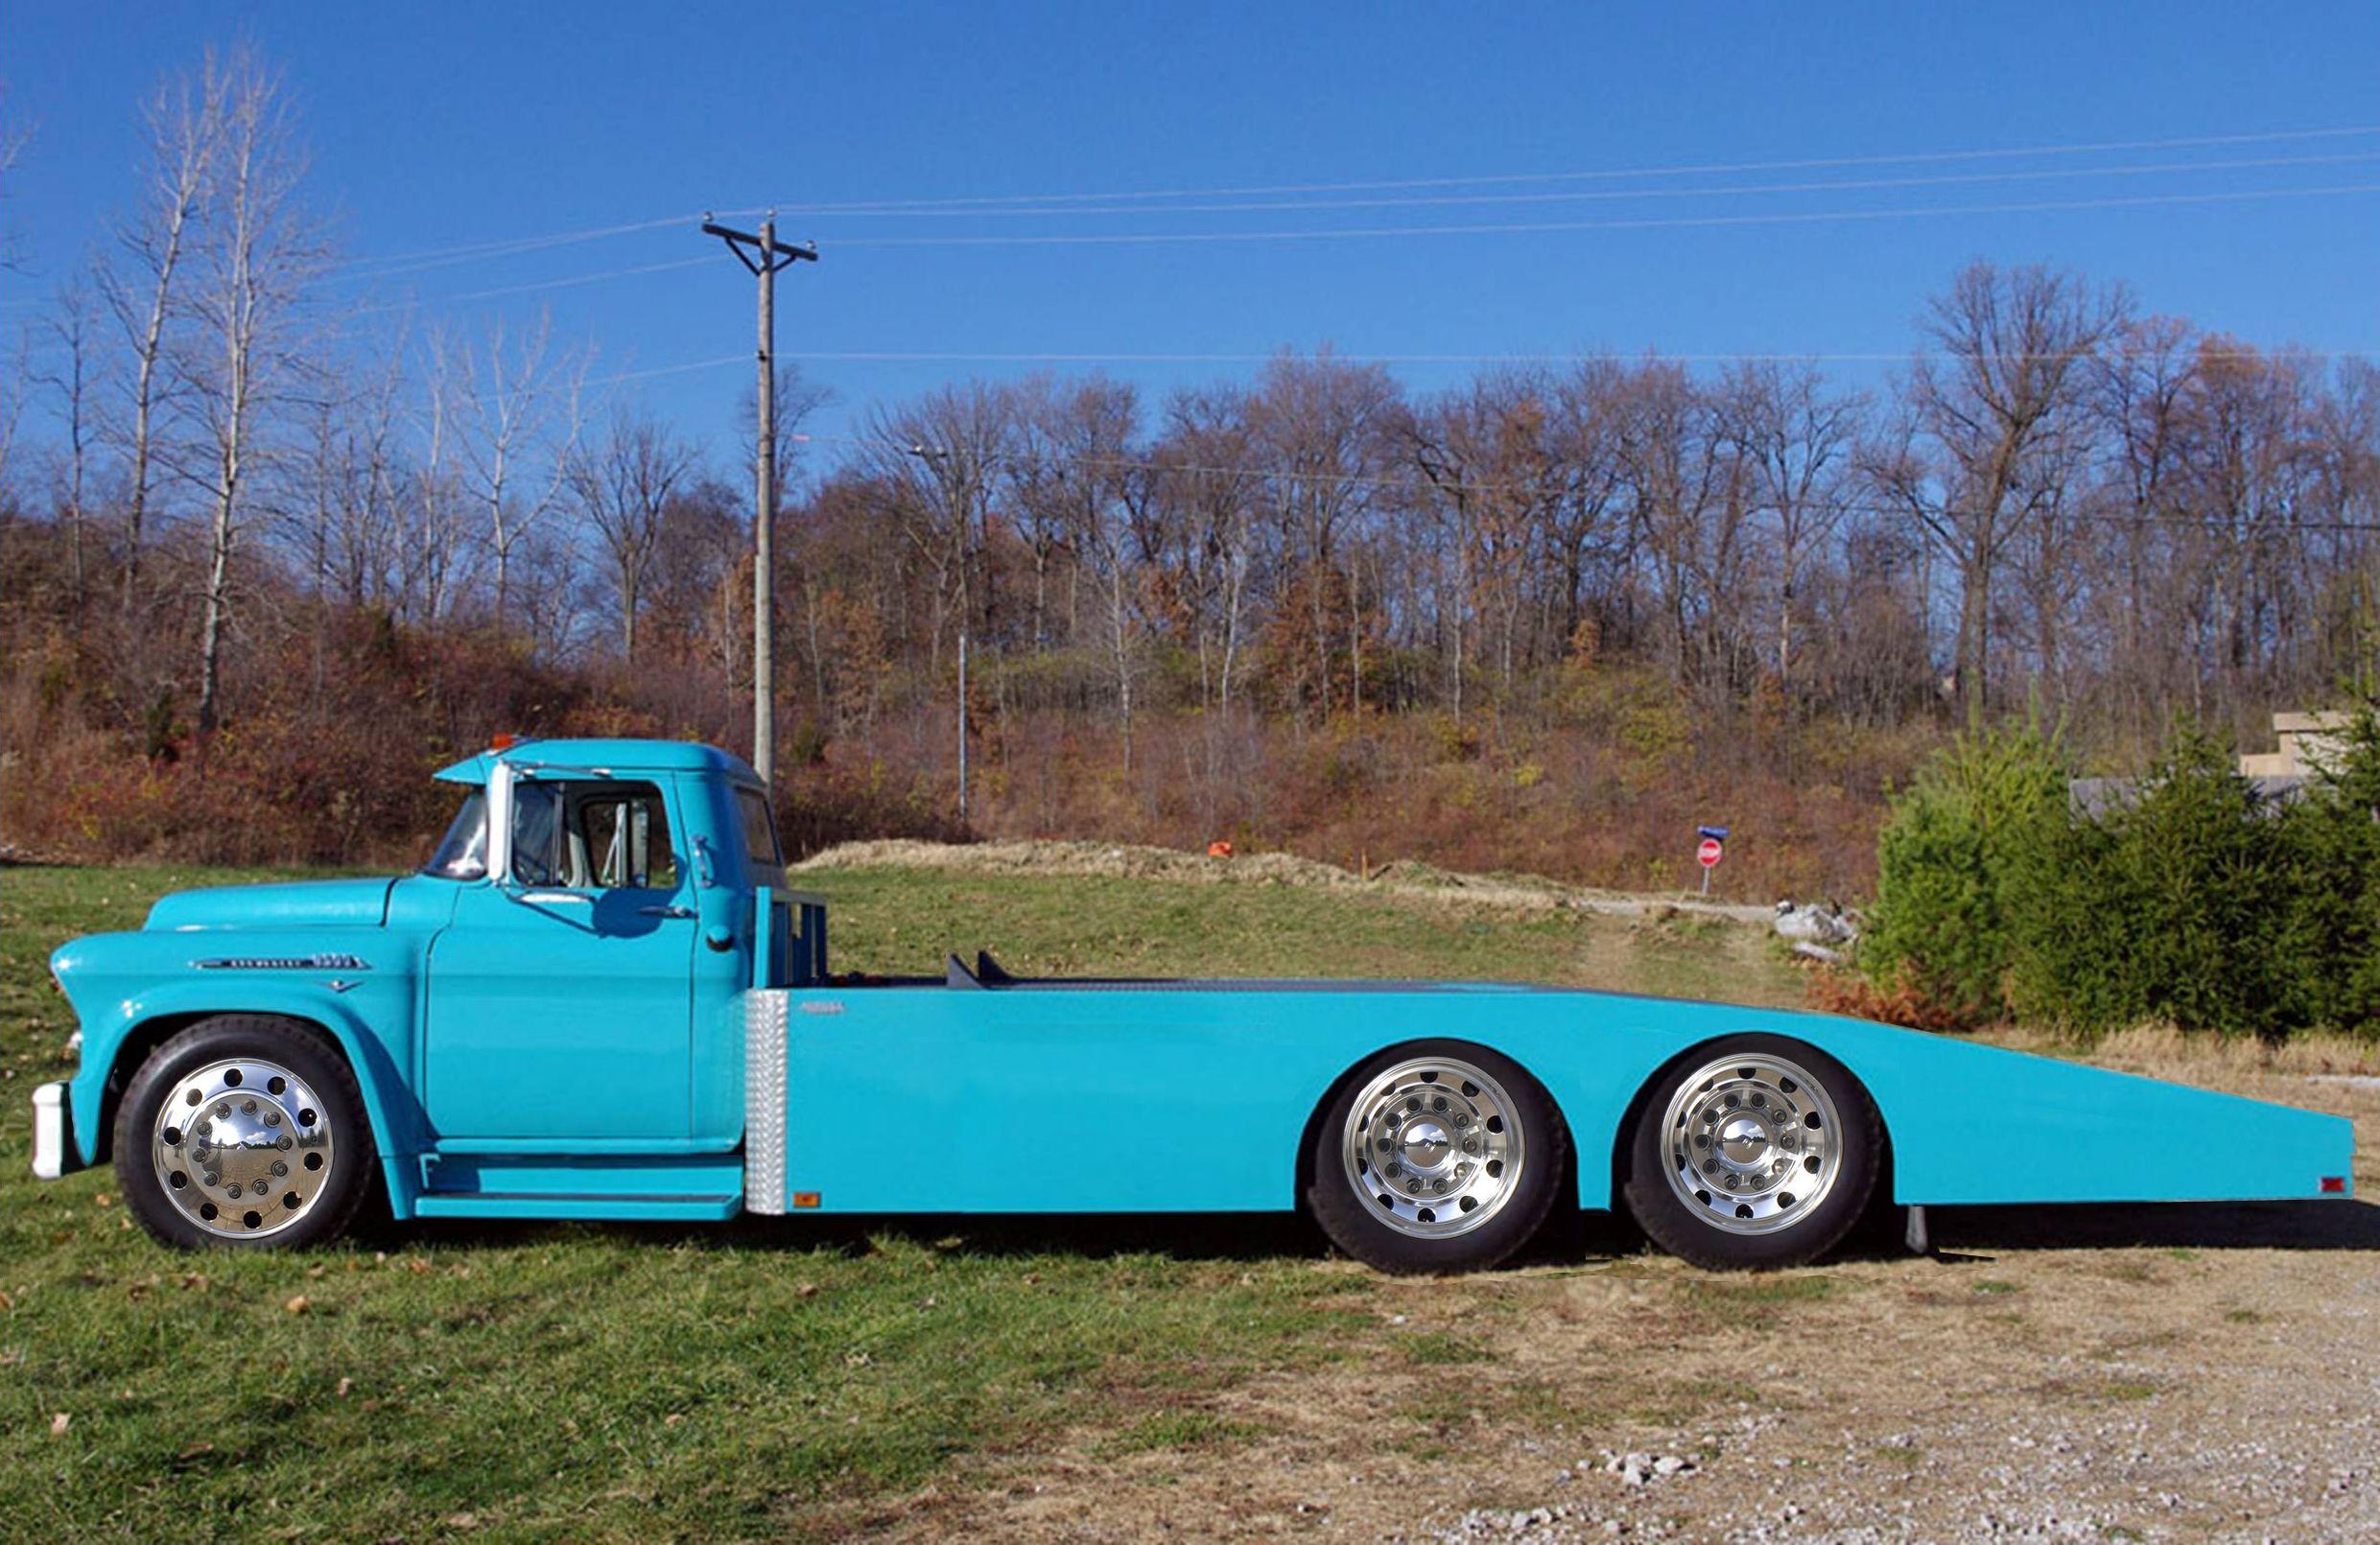 Craigslist Roanoke Cars And Trucks Www Madisontourcompany Com